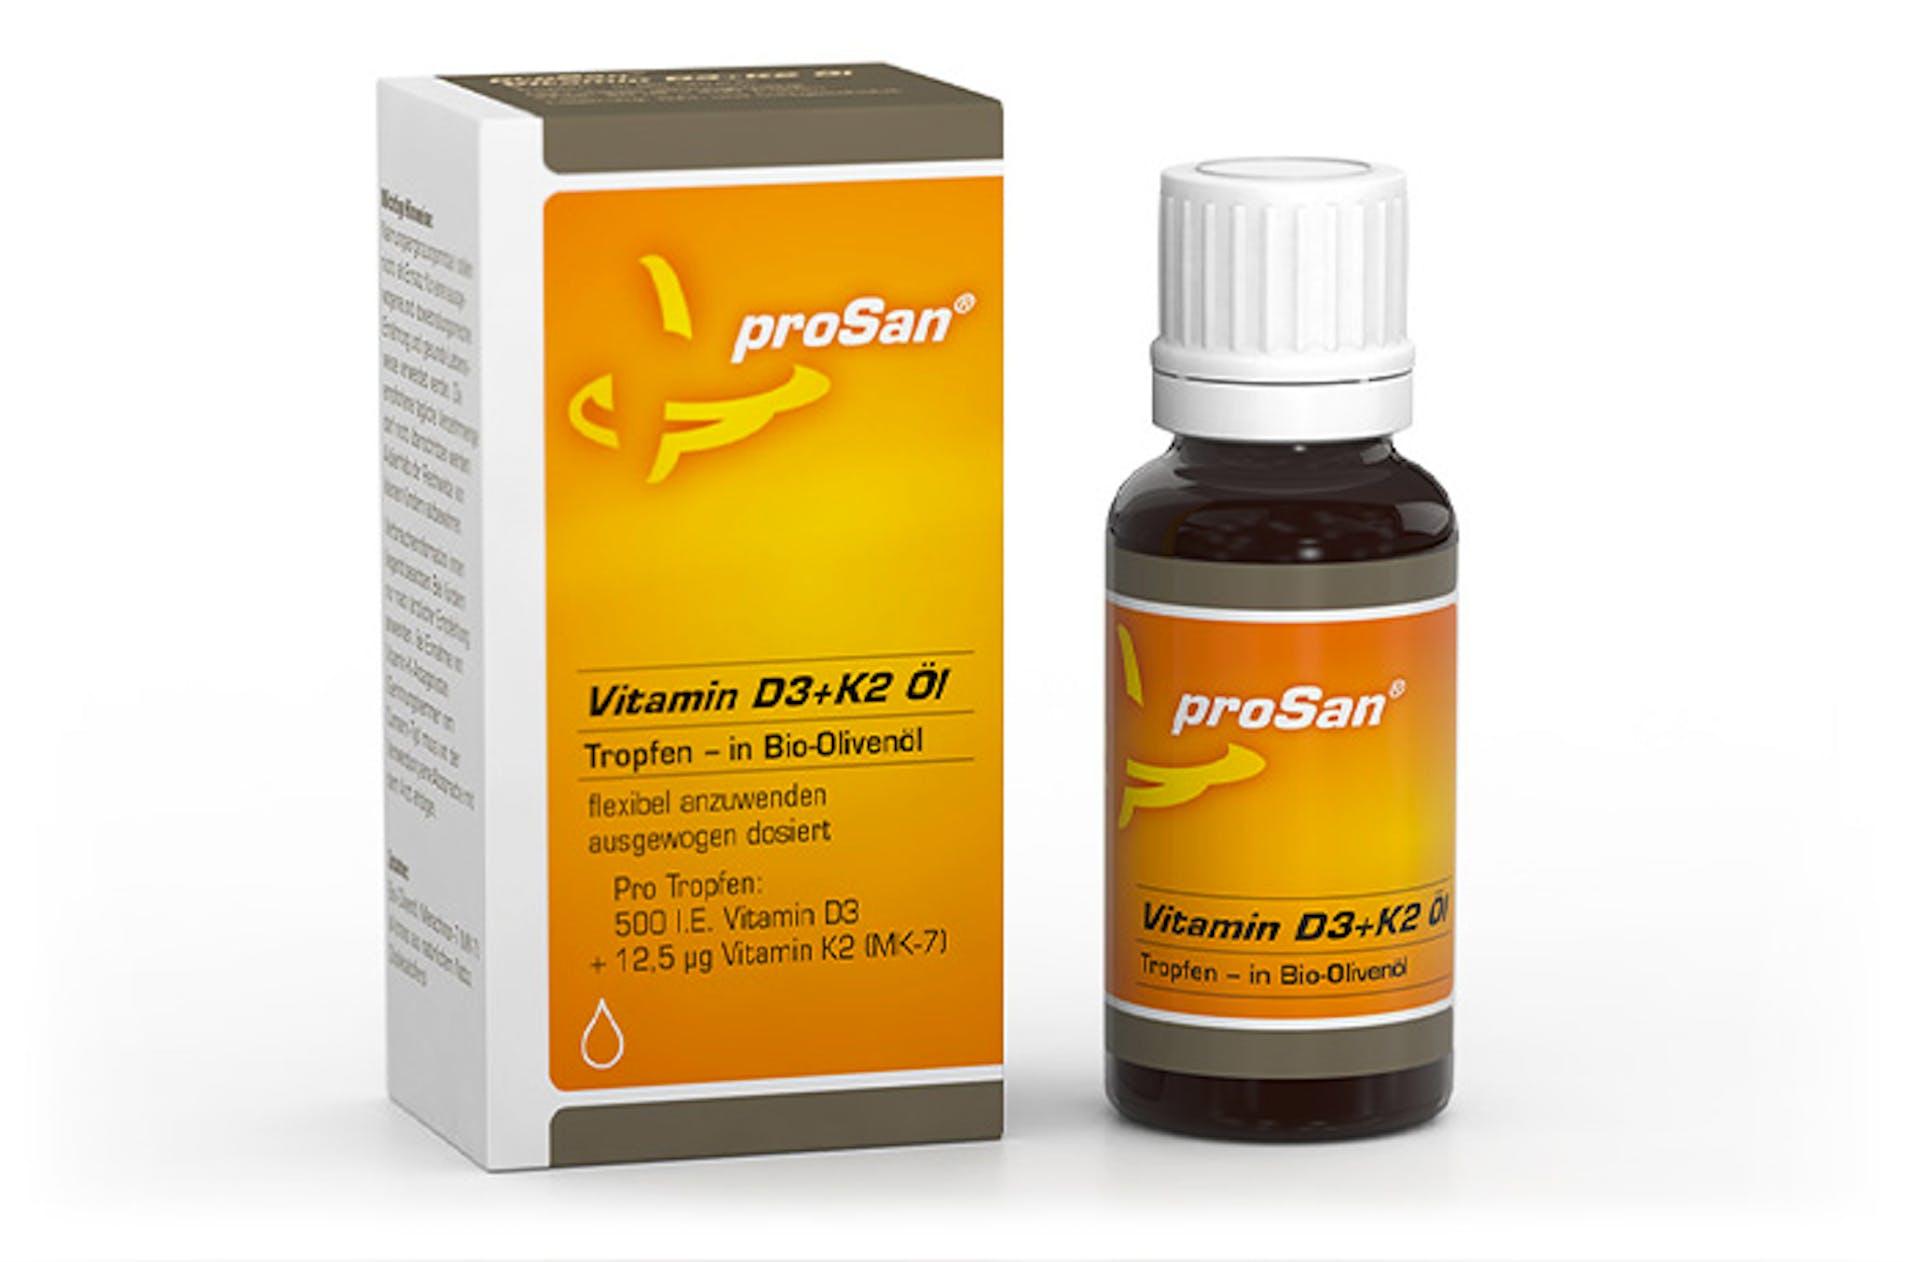 proSan immun vitamin d3+k2 oel kaufen